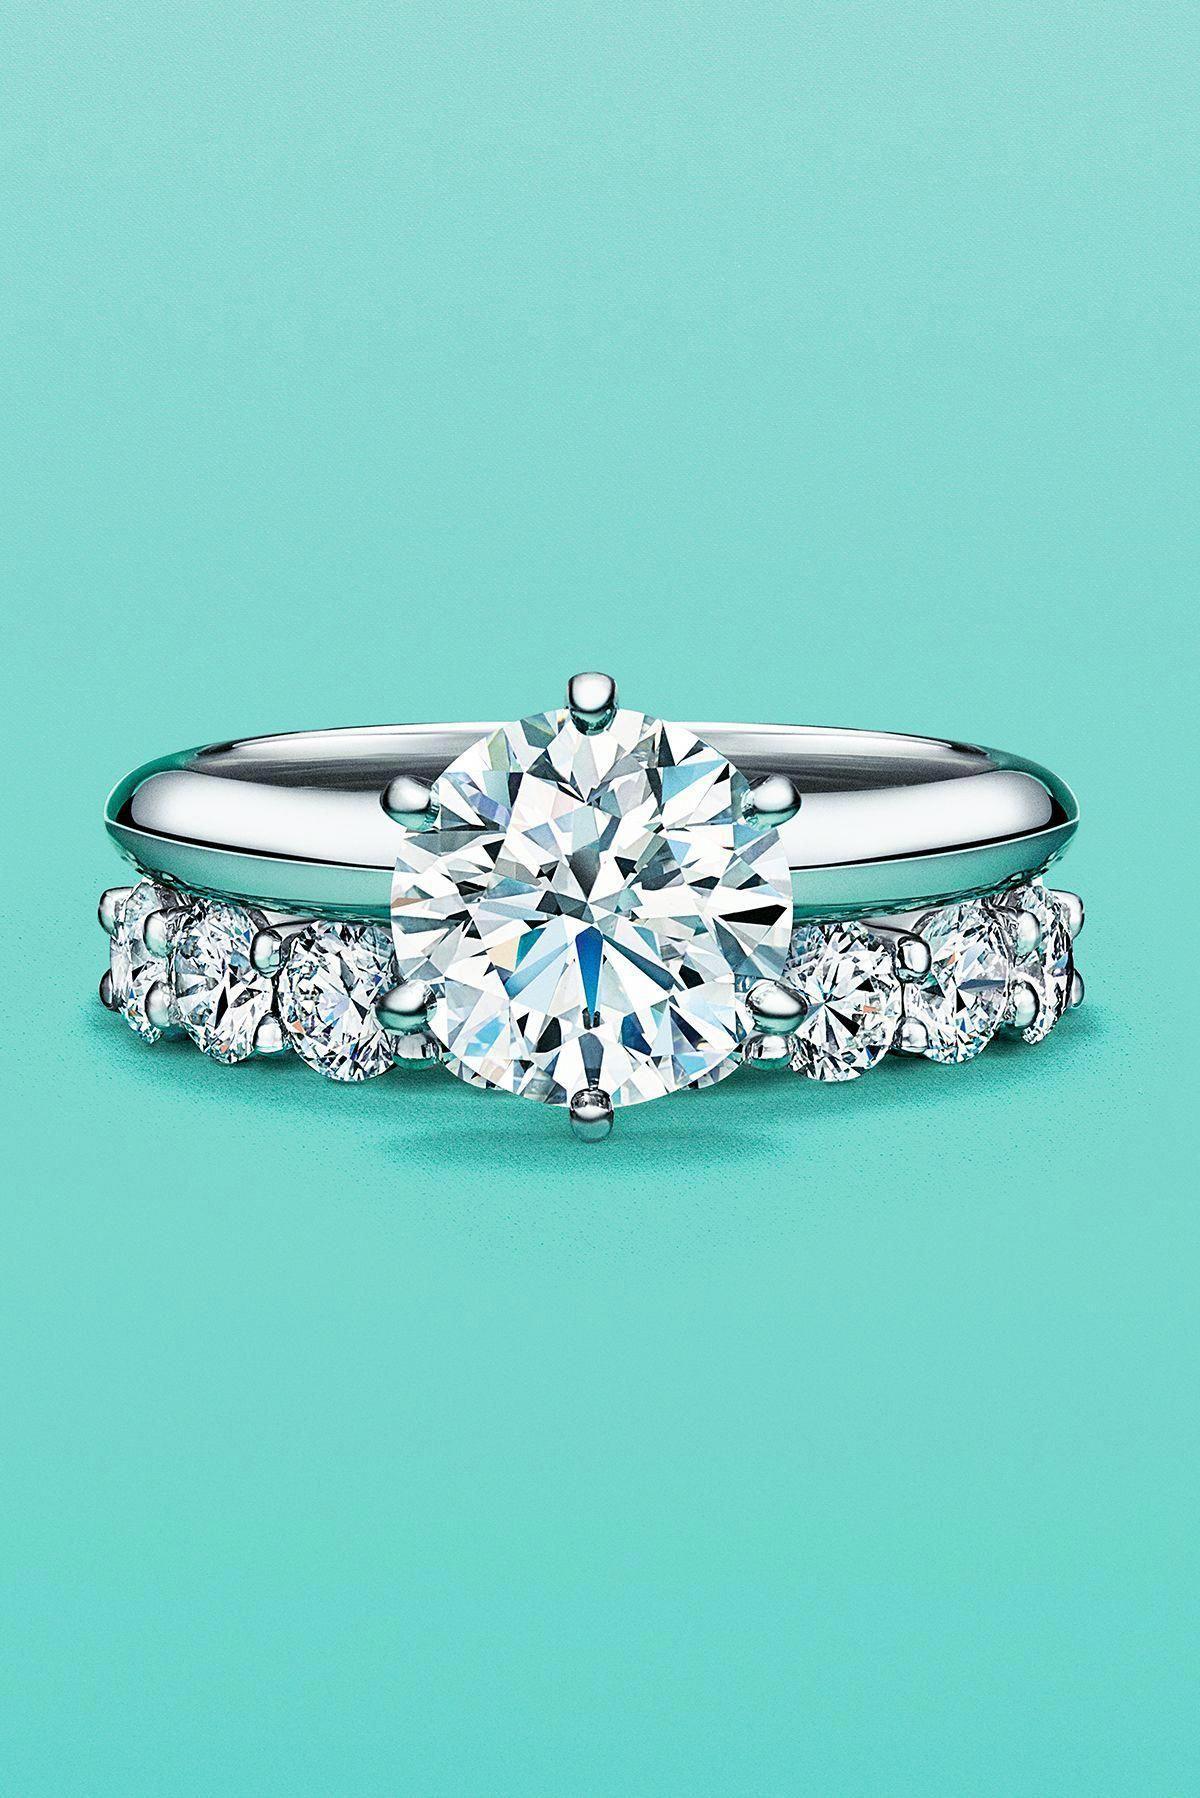 Natural Rough Diamond Engagement Ring 14K Rose Gold Black